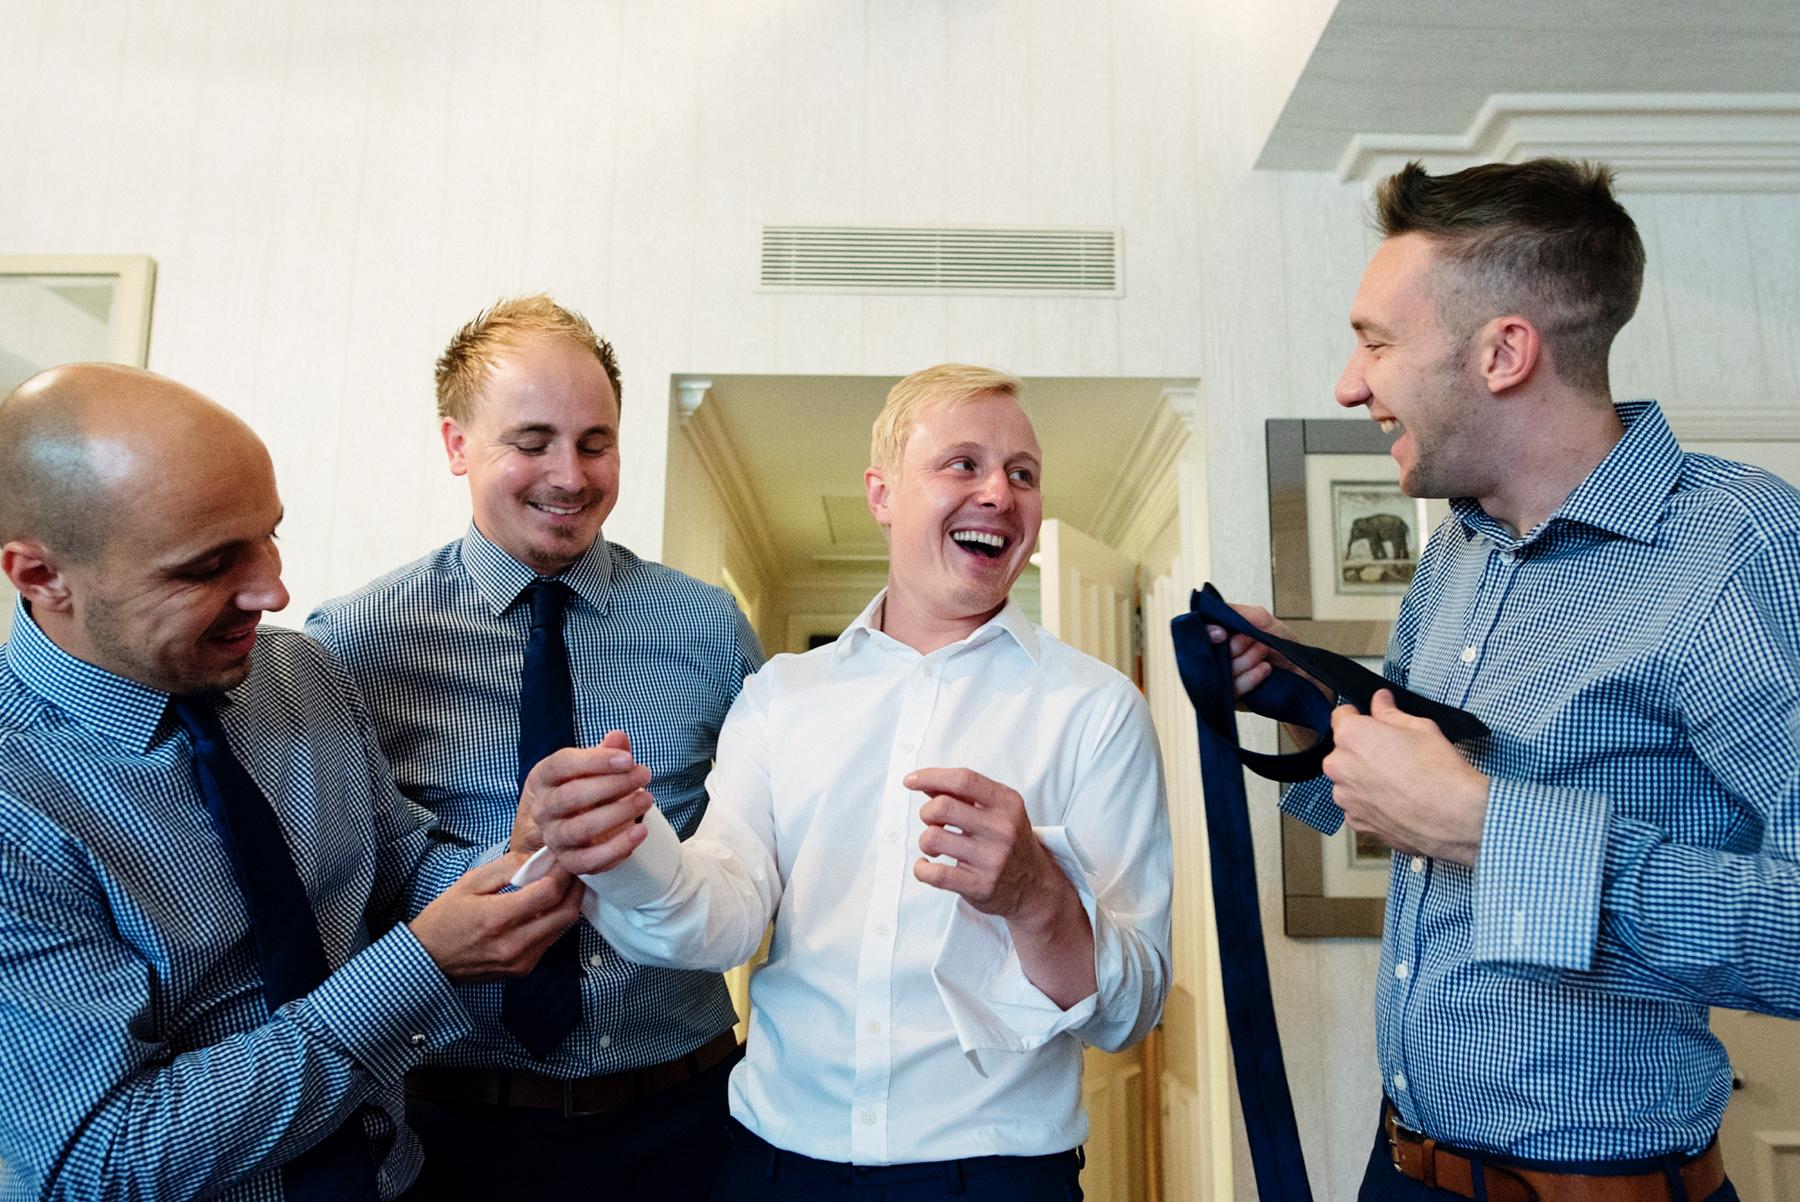 Hawes & Curtis groom with groomsmen Babb